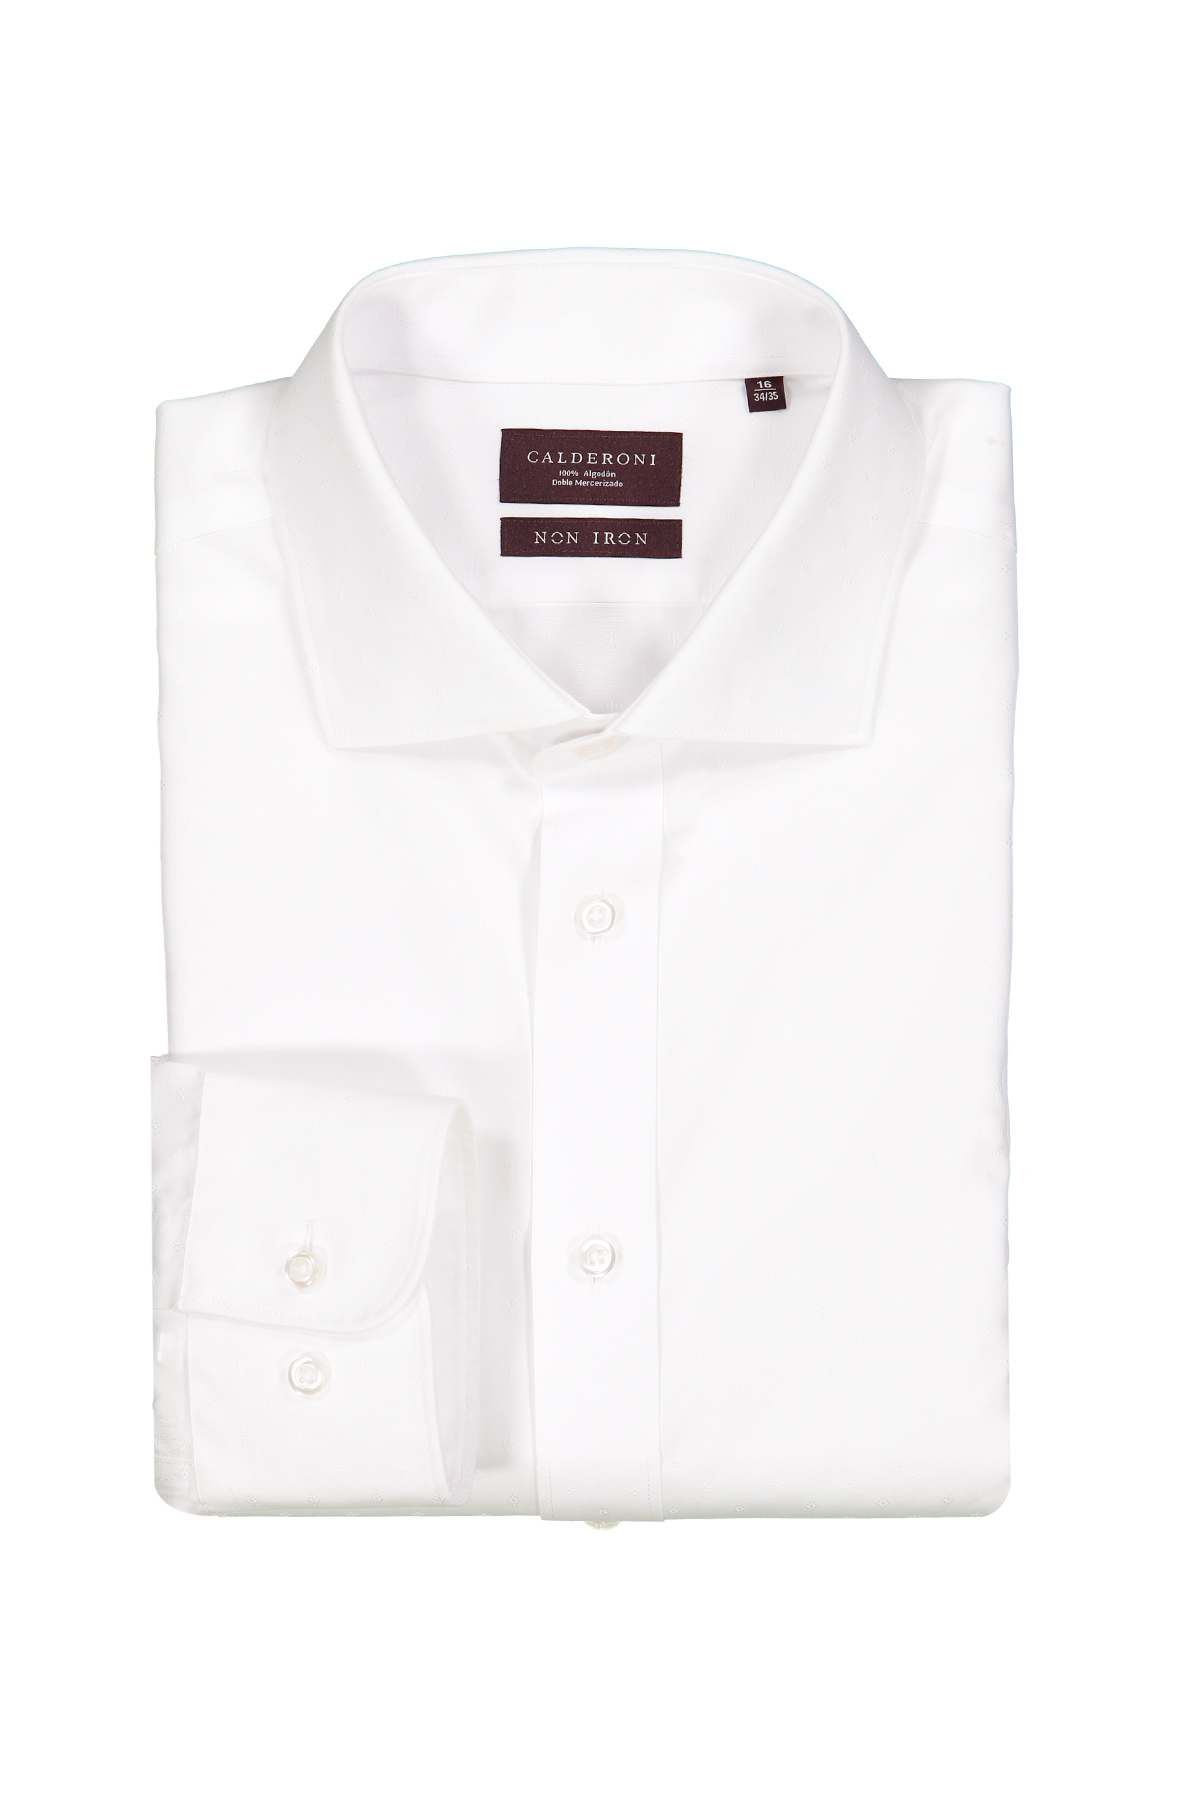 Camisa Calderoni -Non Iron 24/7- jacquard blanco liso.